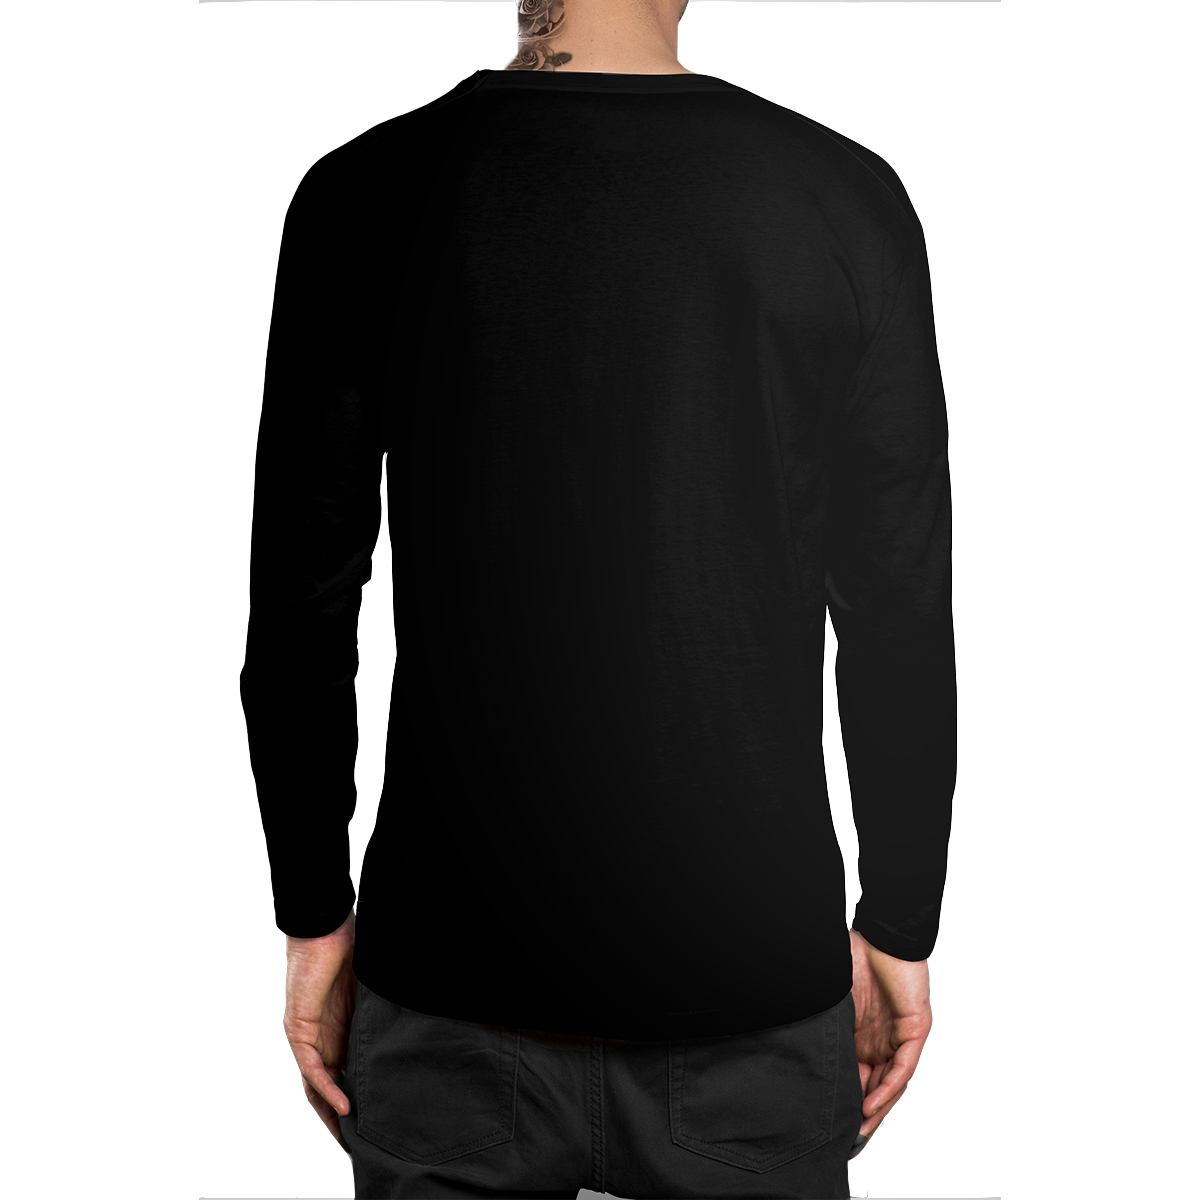 Stompy Camiseta Manga Longa Modelo 05